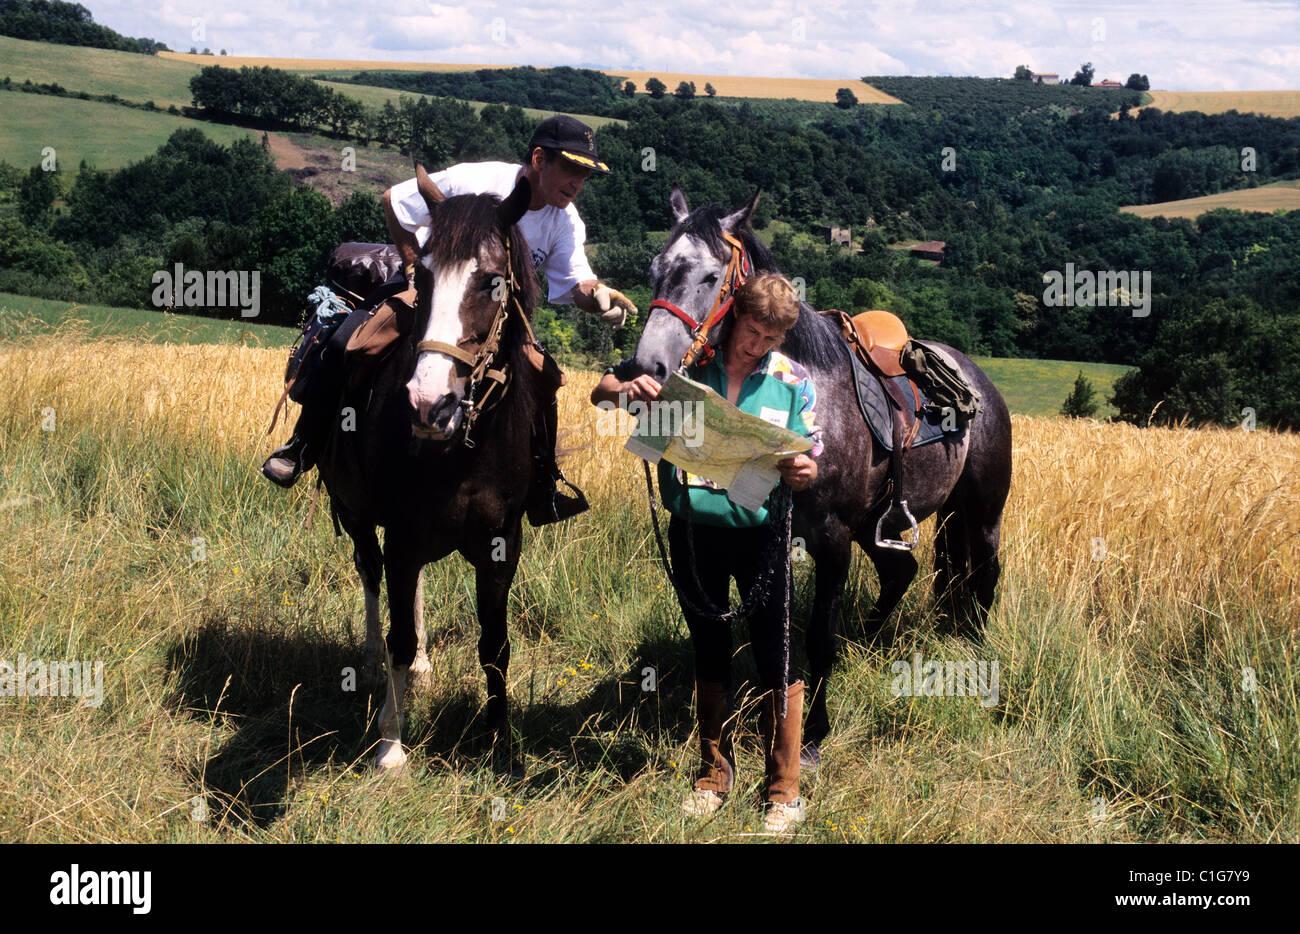 France, Drome, tourisme equestre - Stock Image